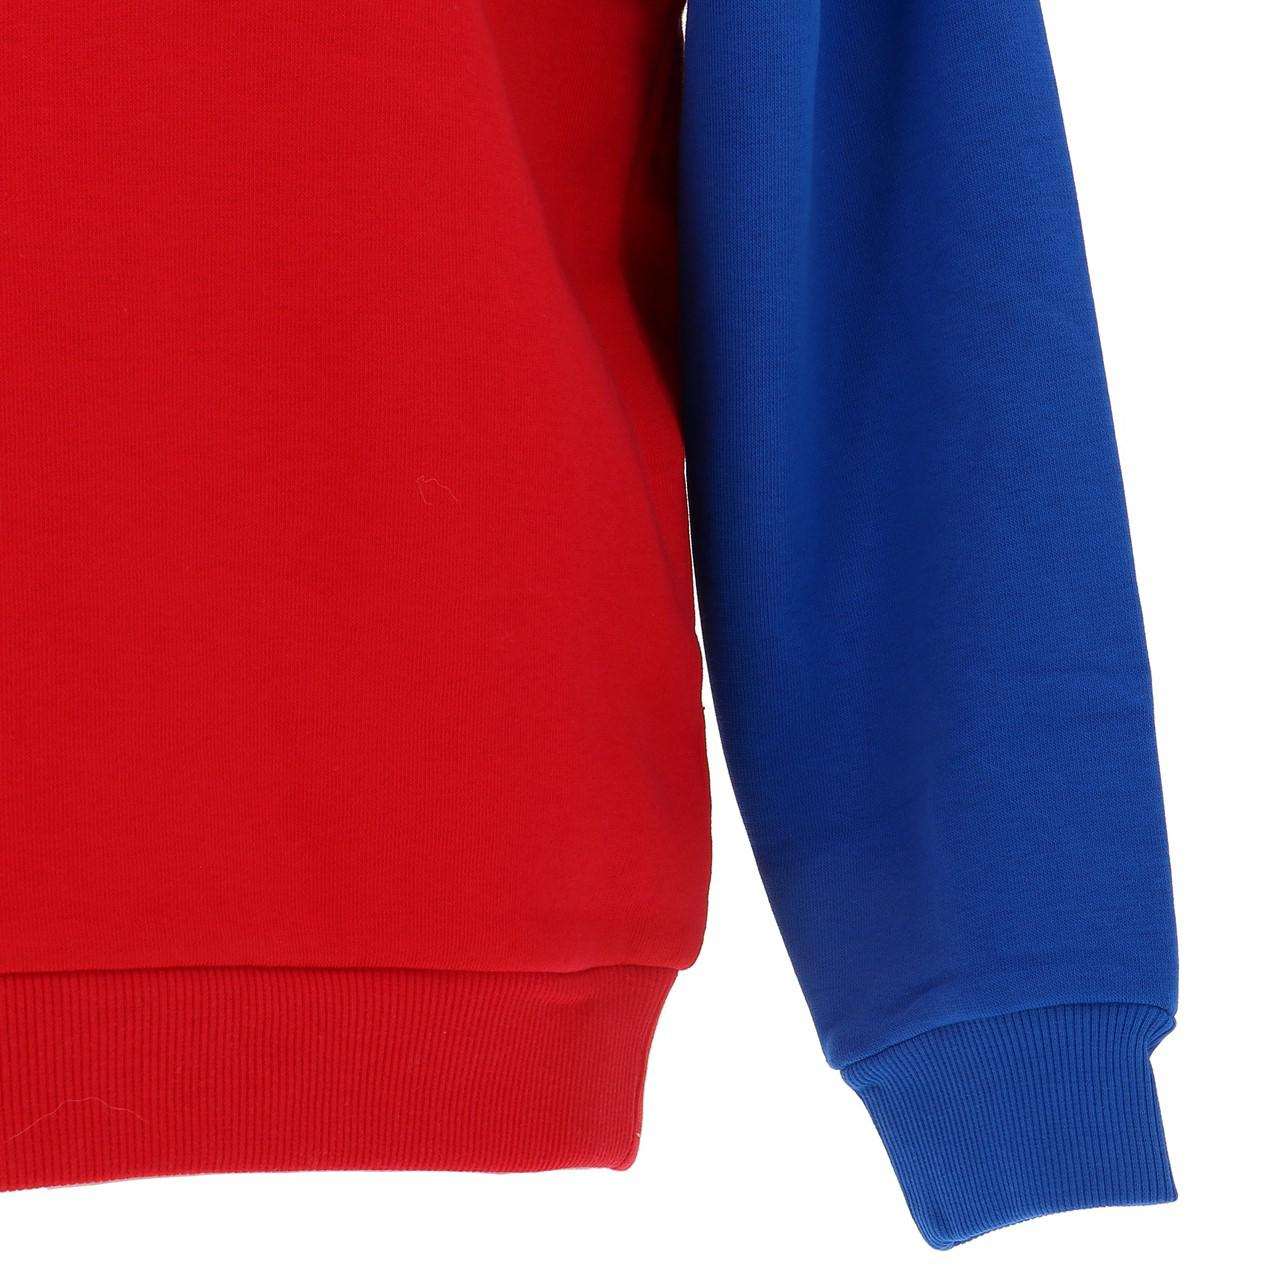 Sweatshirt-Fila-Nacht-Blockiert-Jr-Roy-Rge-Blau-43025-Neu Indexbild 4